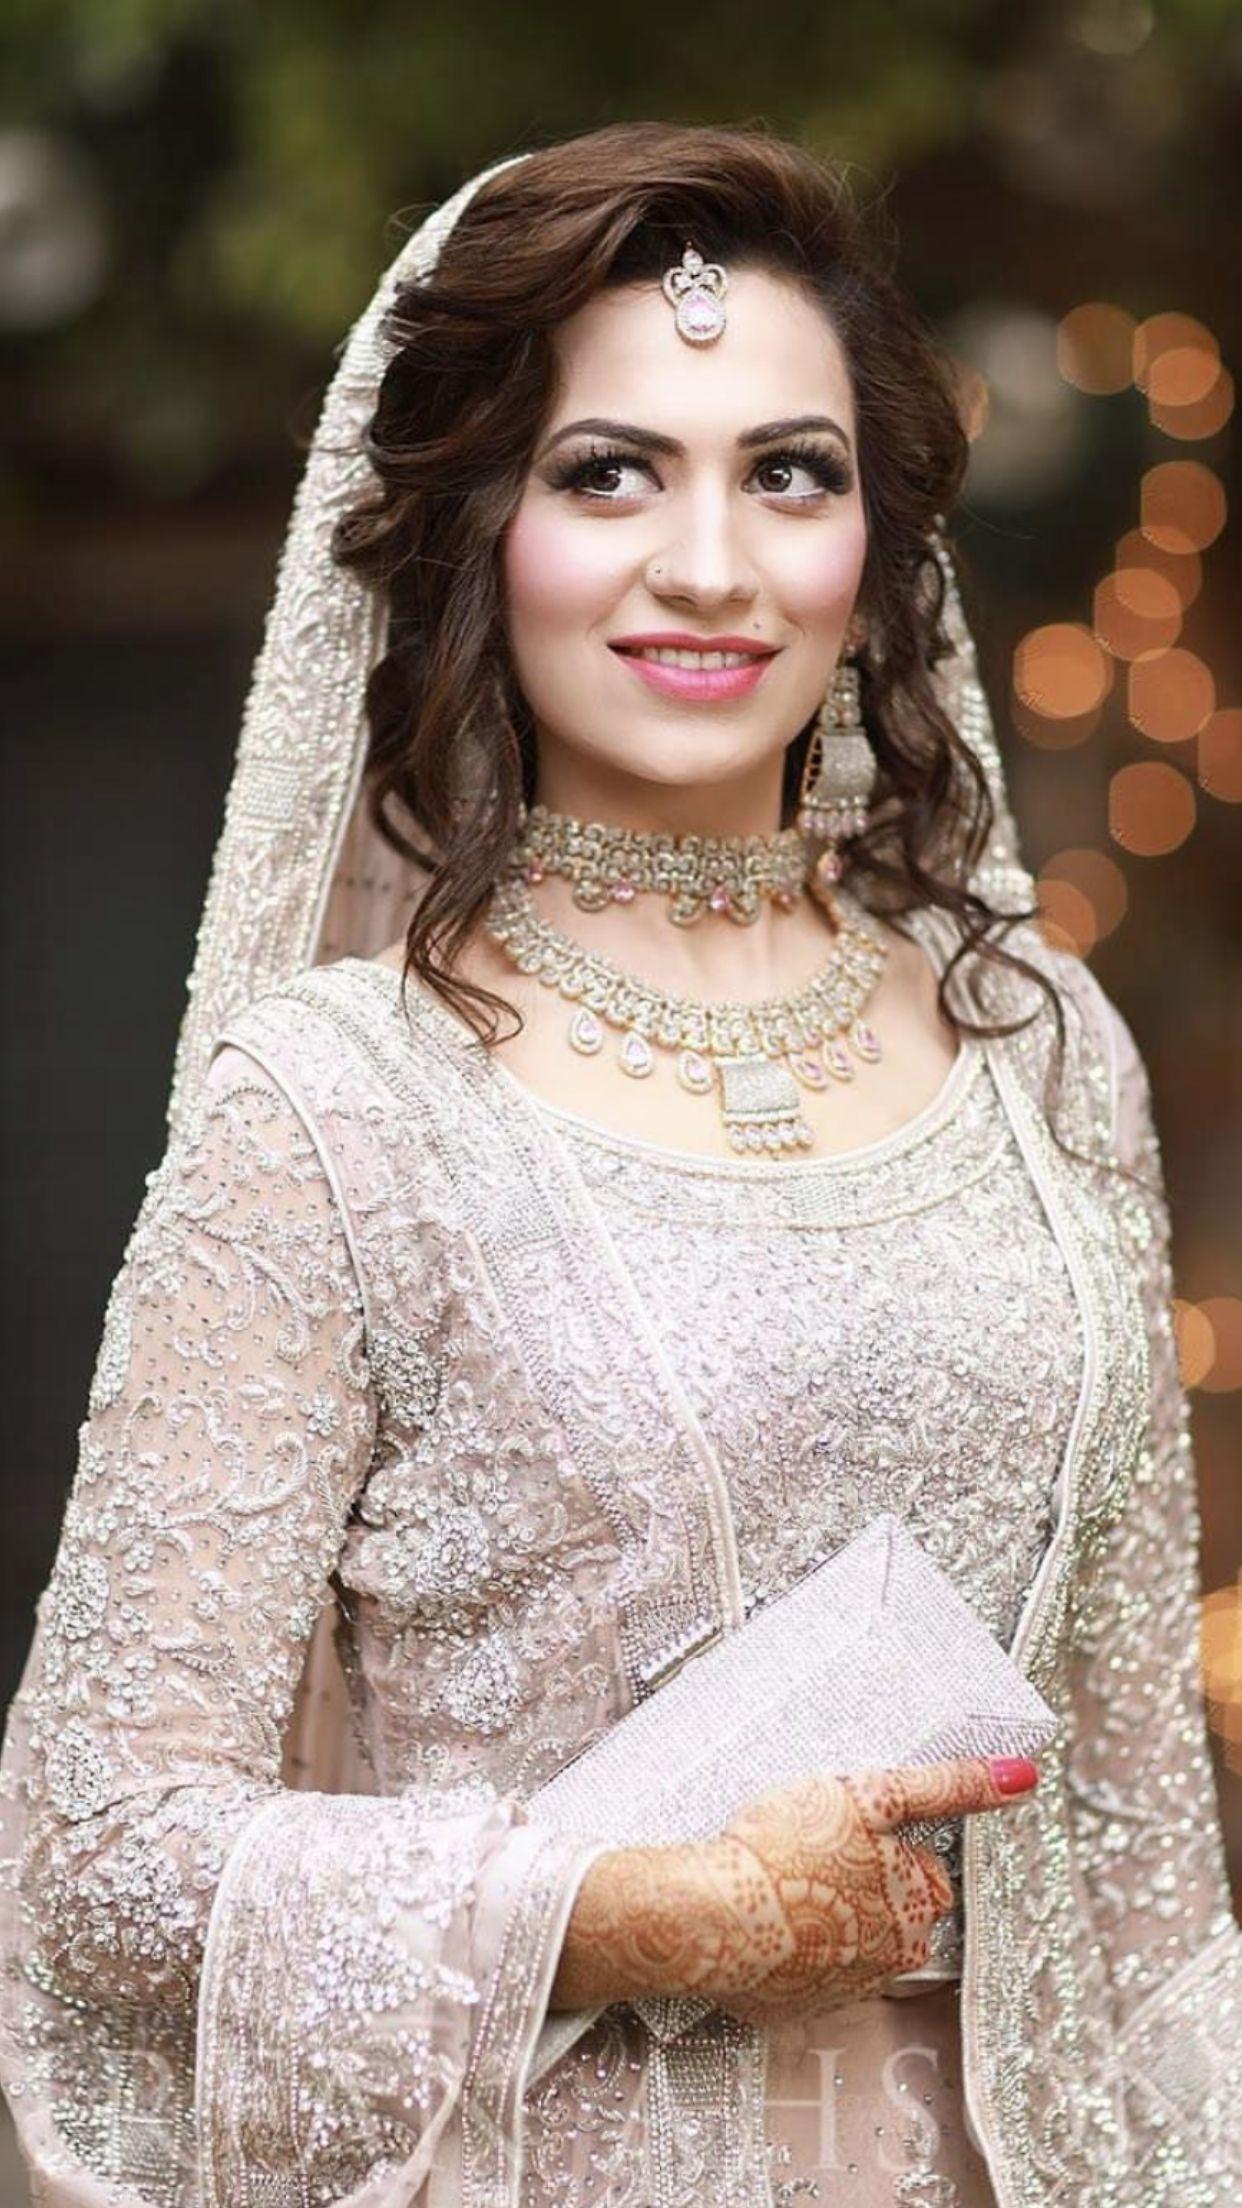 Best Desi Bridal Hairstyle Picture Pakistani bridal wear